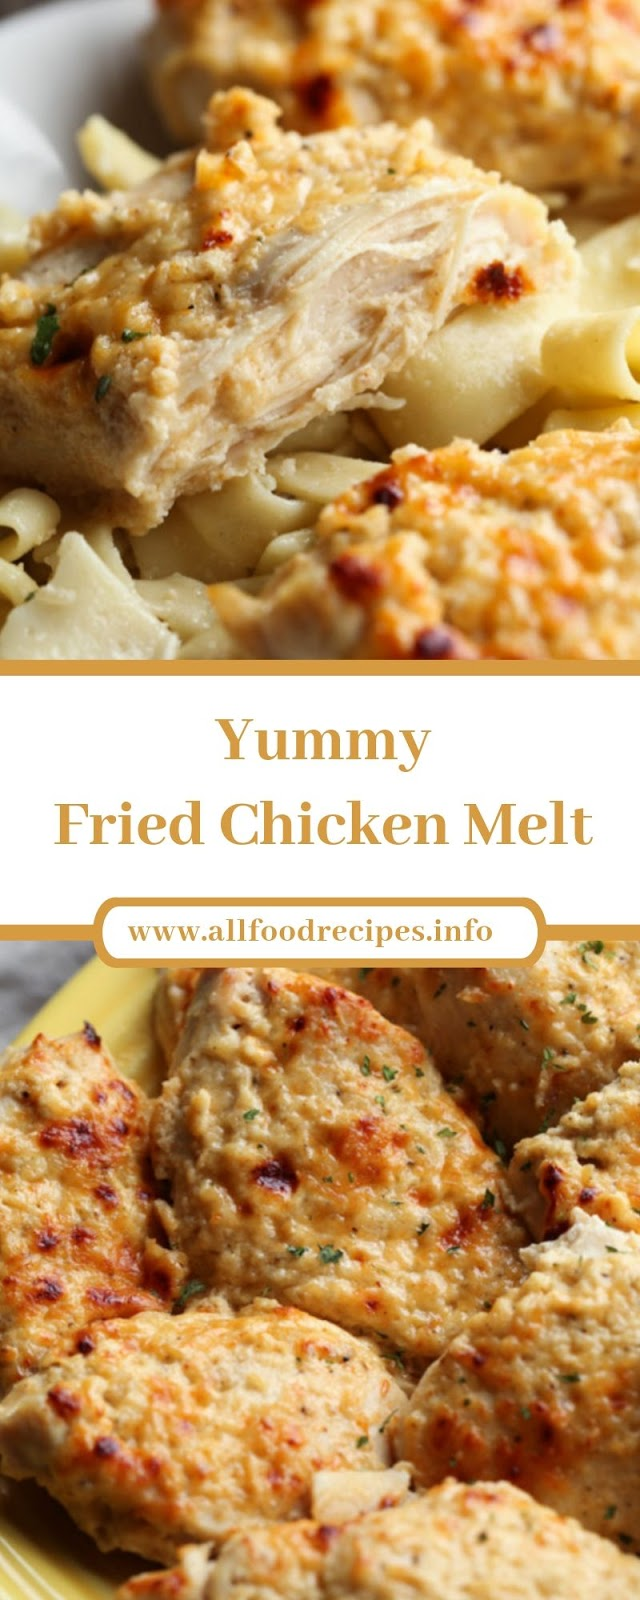 Yummy Fried Chicken Melt